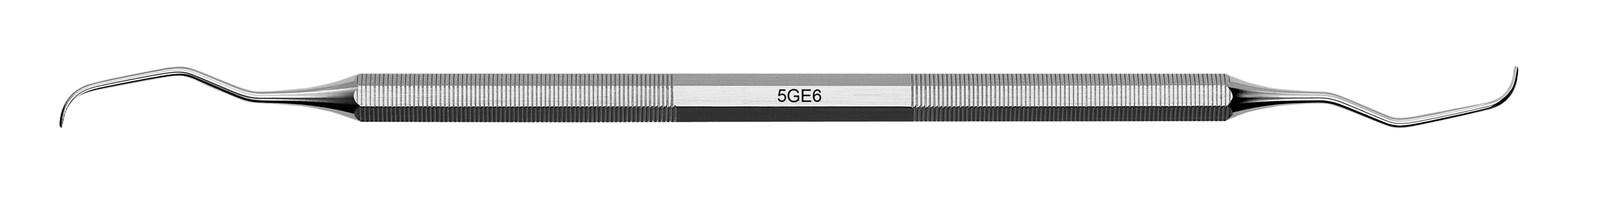 Kyreta Gracey Classic - 5GE6, Bez návleku